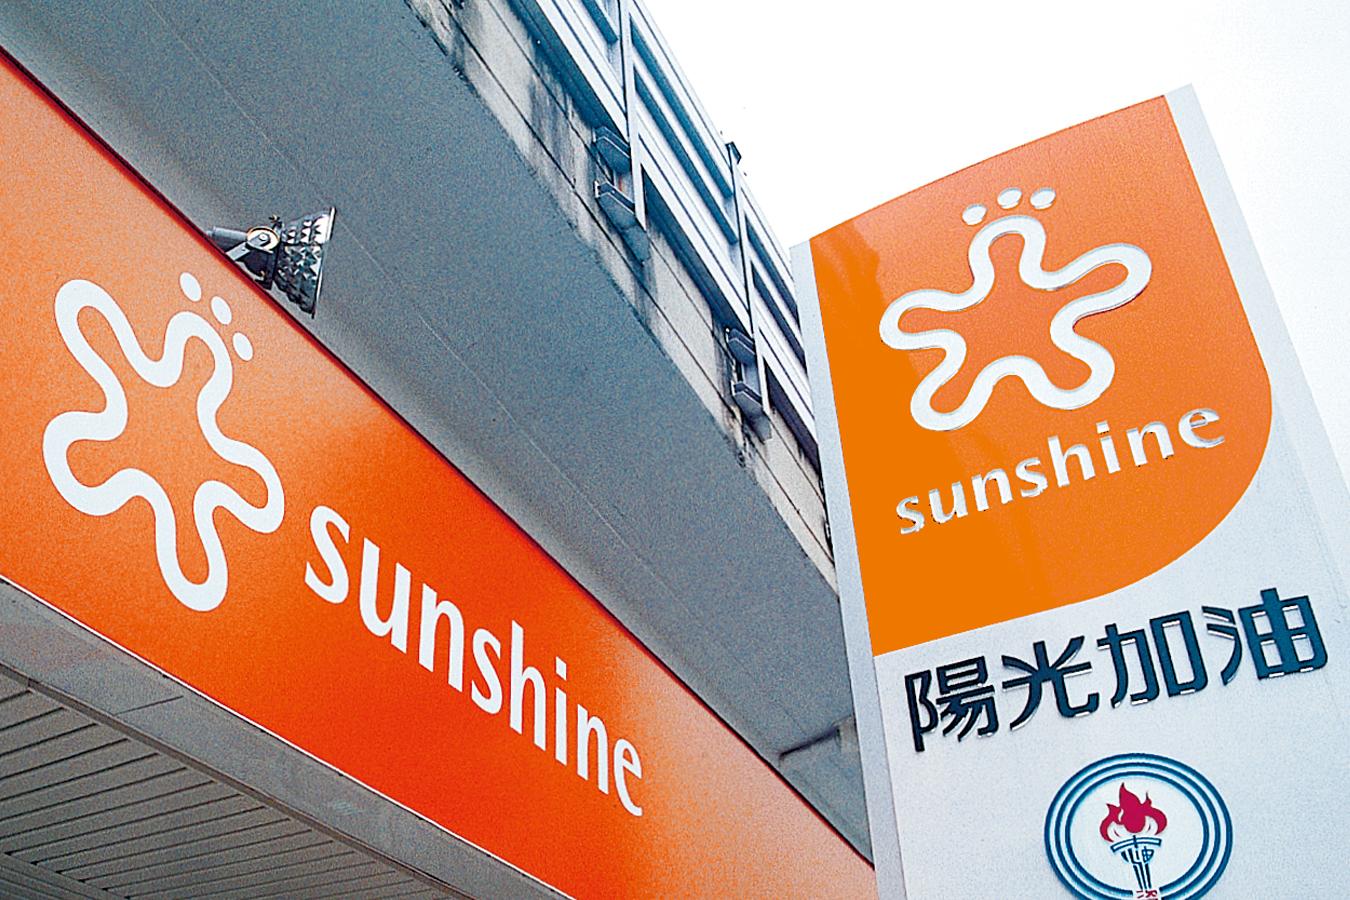 sunshine 陽光加油站/汽車美容 品牌策略/形象整體BI規劃設計